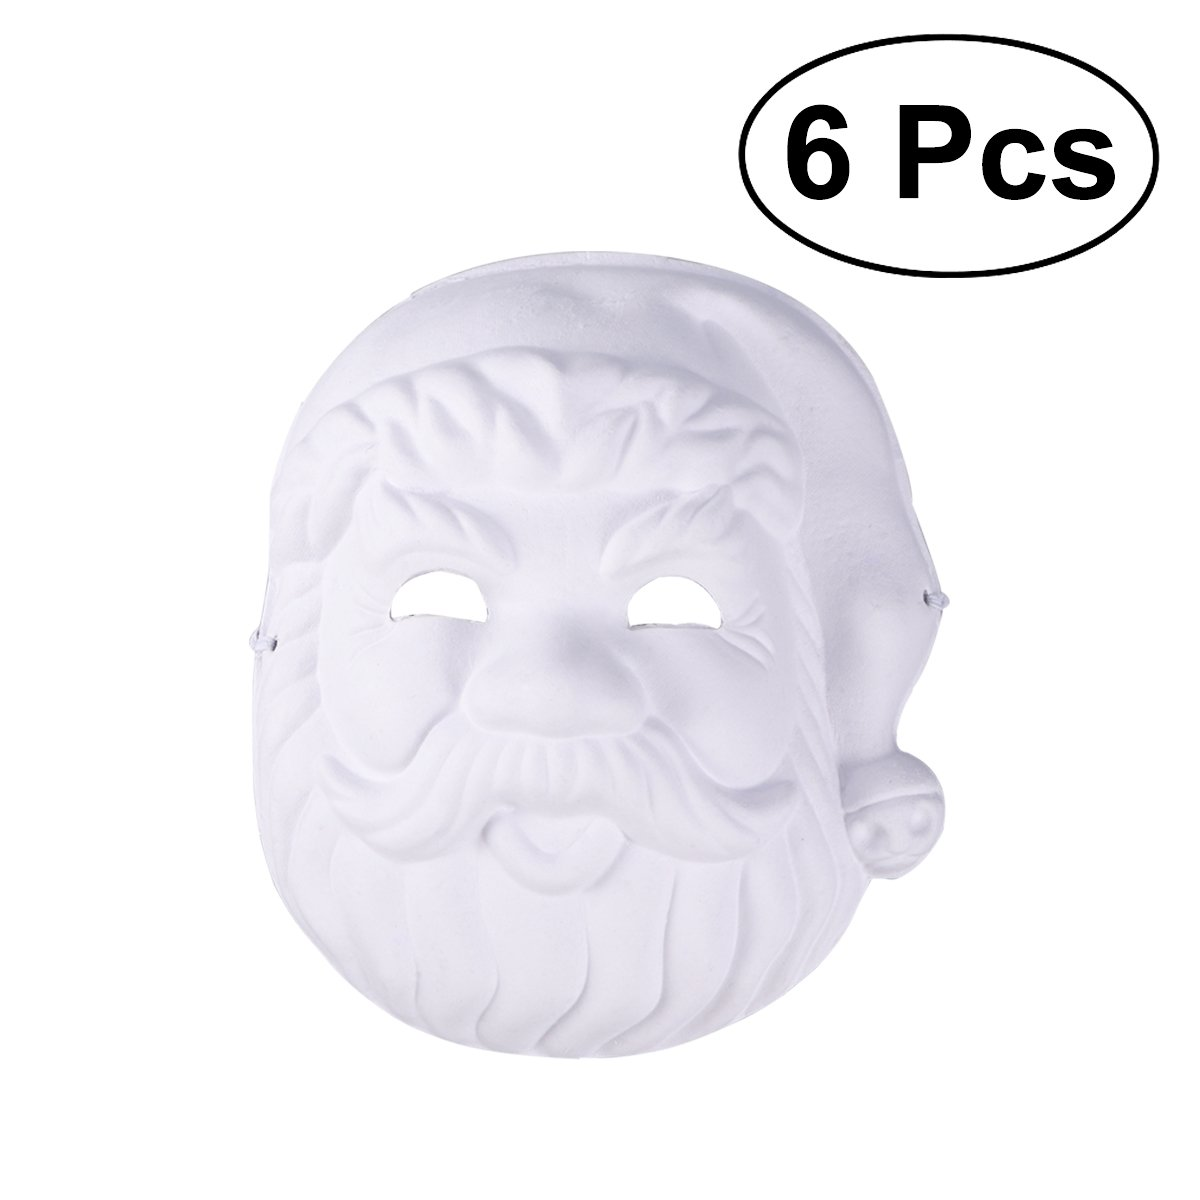 TINKSKY 6pcs Christmas Painting Mask Blank Mask for DIY Paint Christmas Santa